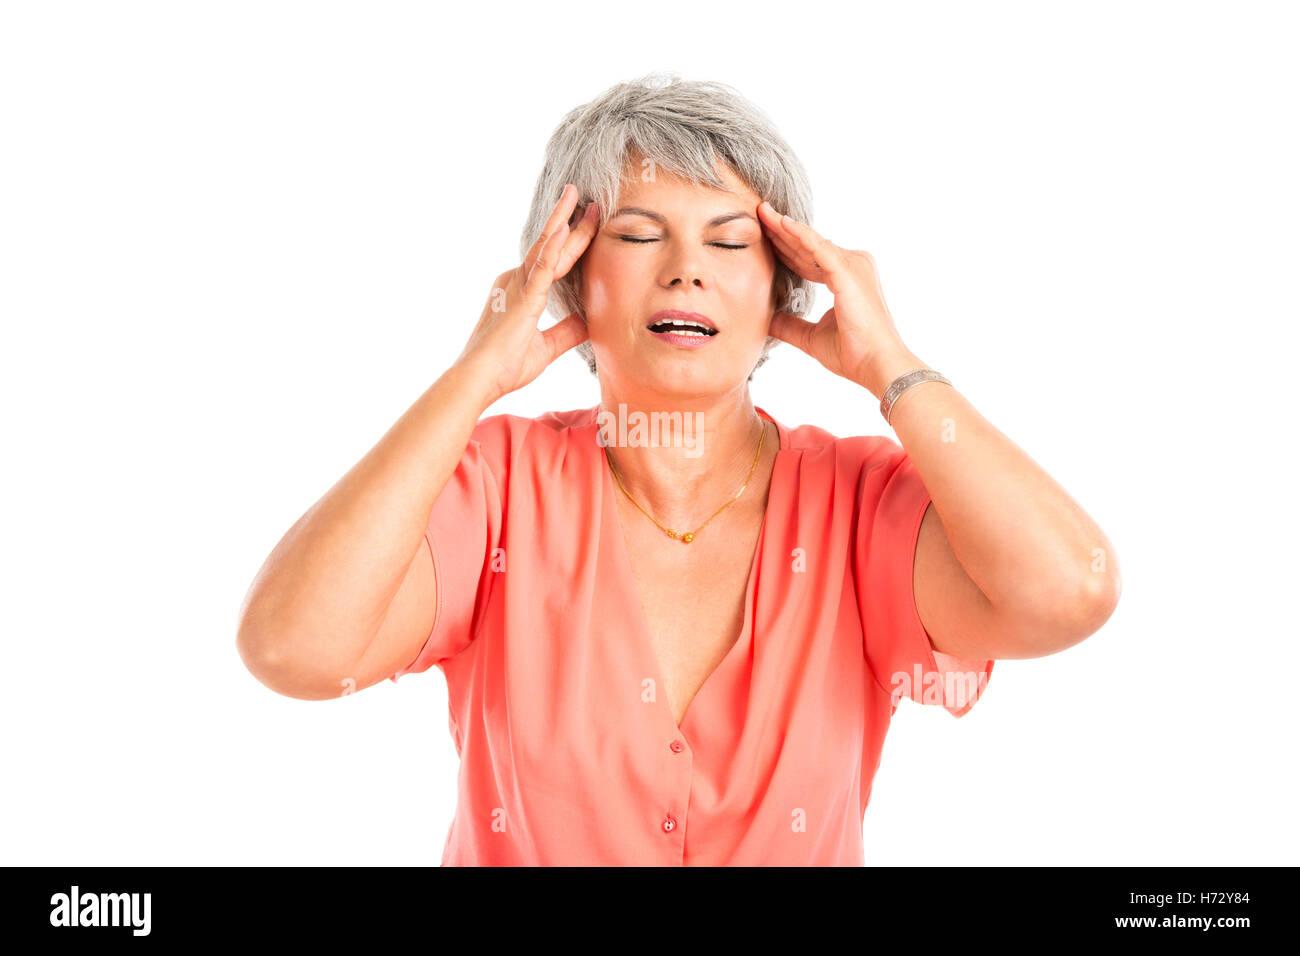 feelings emotions - Stock Image